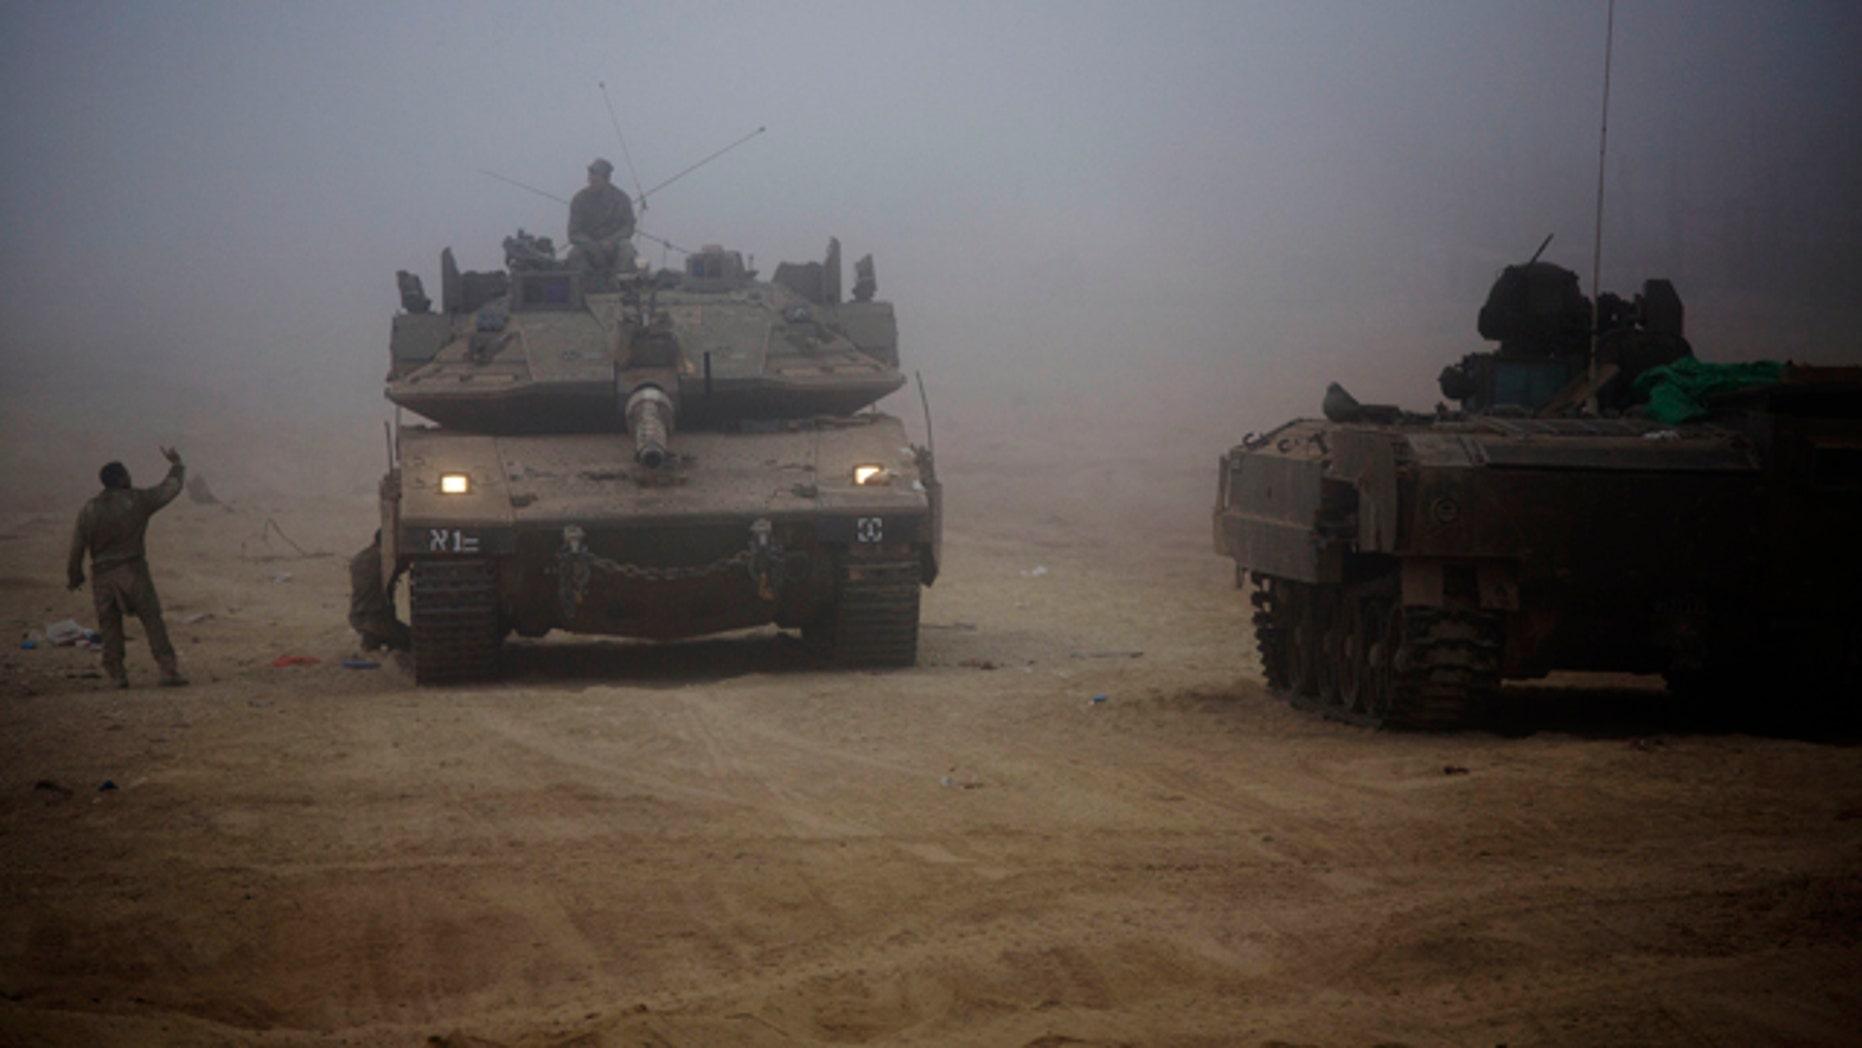 July 24, 2014: An Israeli tank moves through the morning mist near the Israel and Gaza border. (AP Photo/Dusan Vranic)